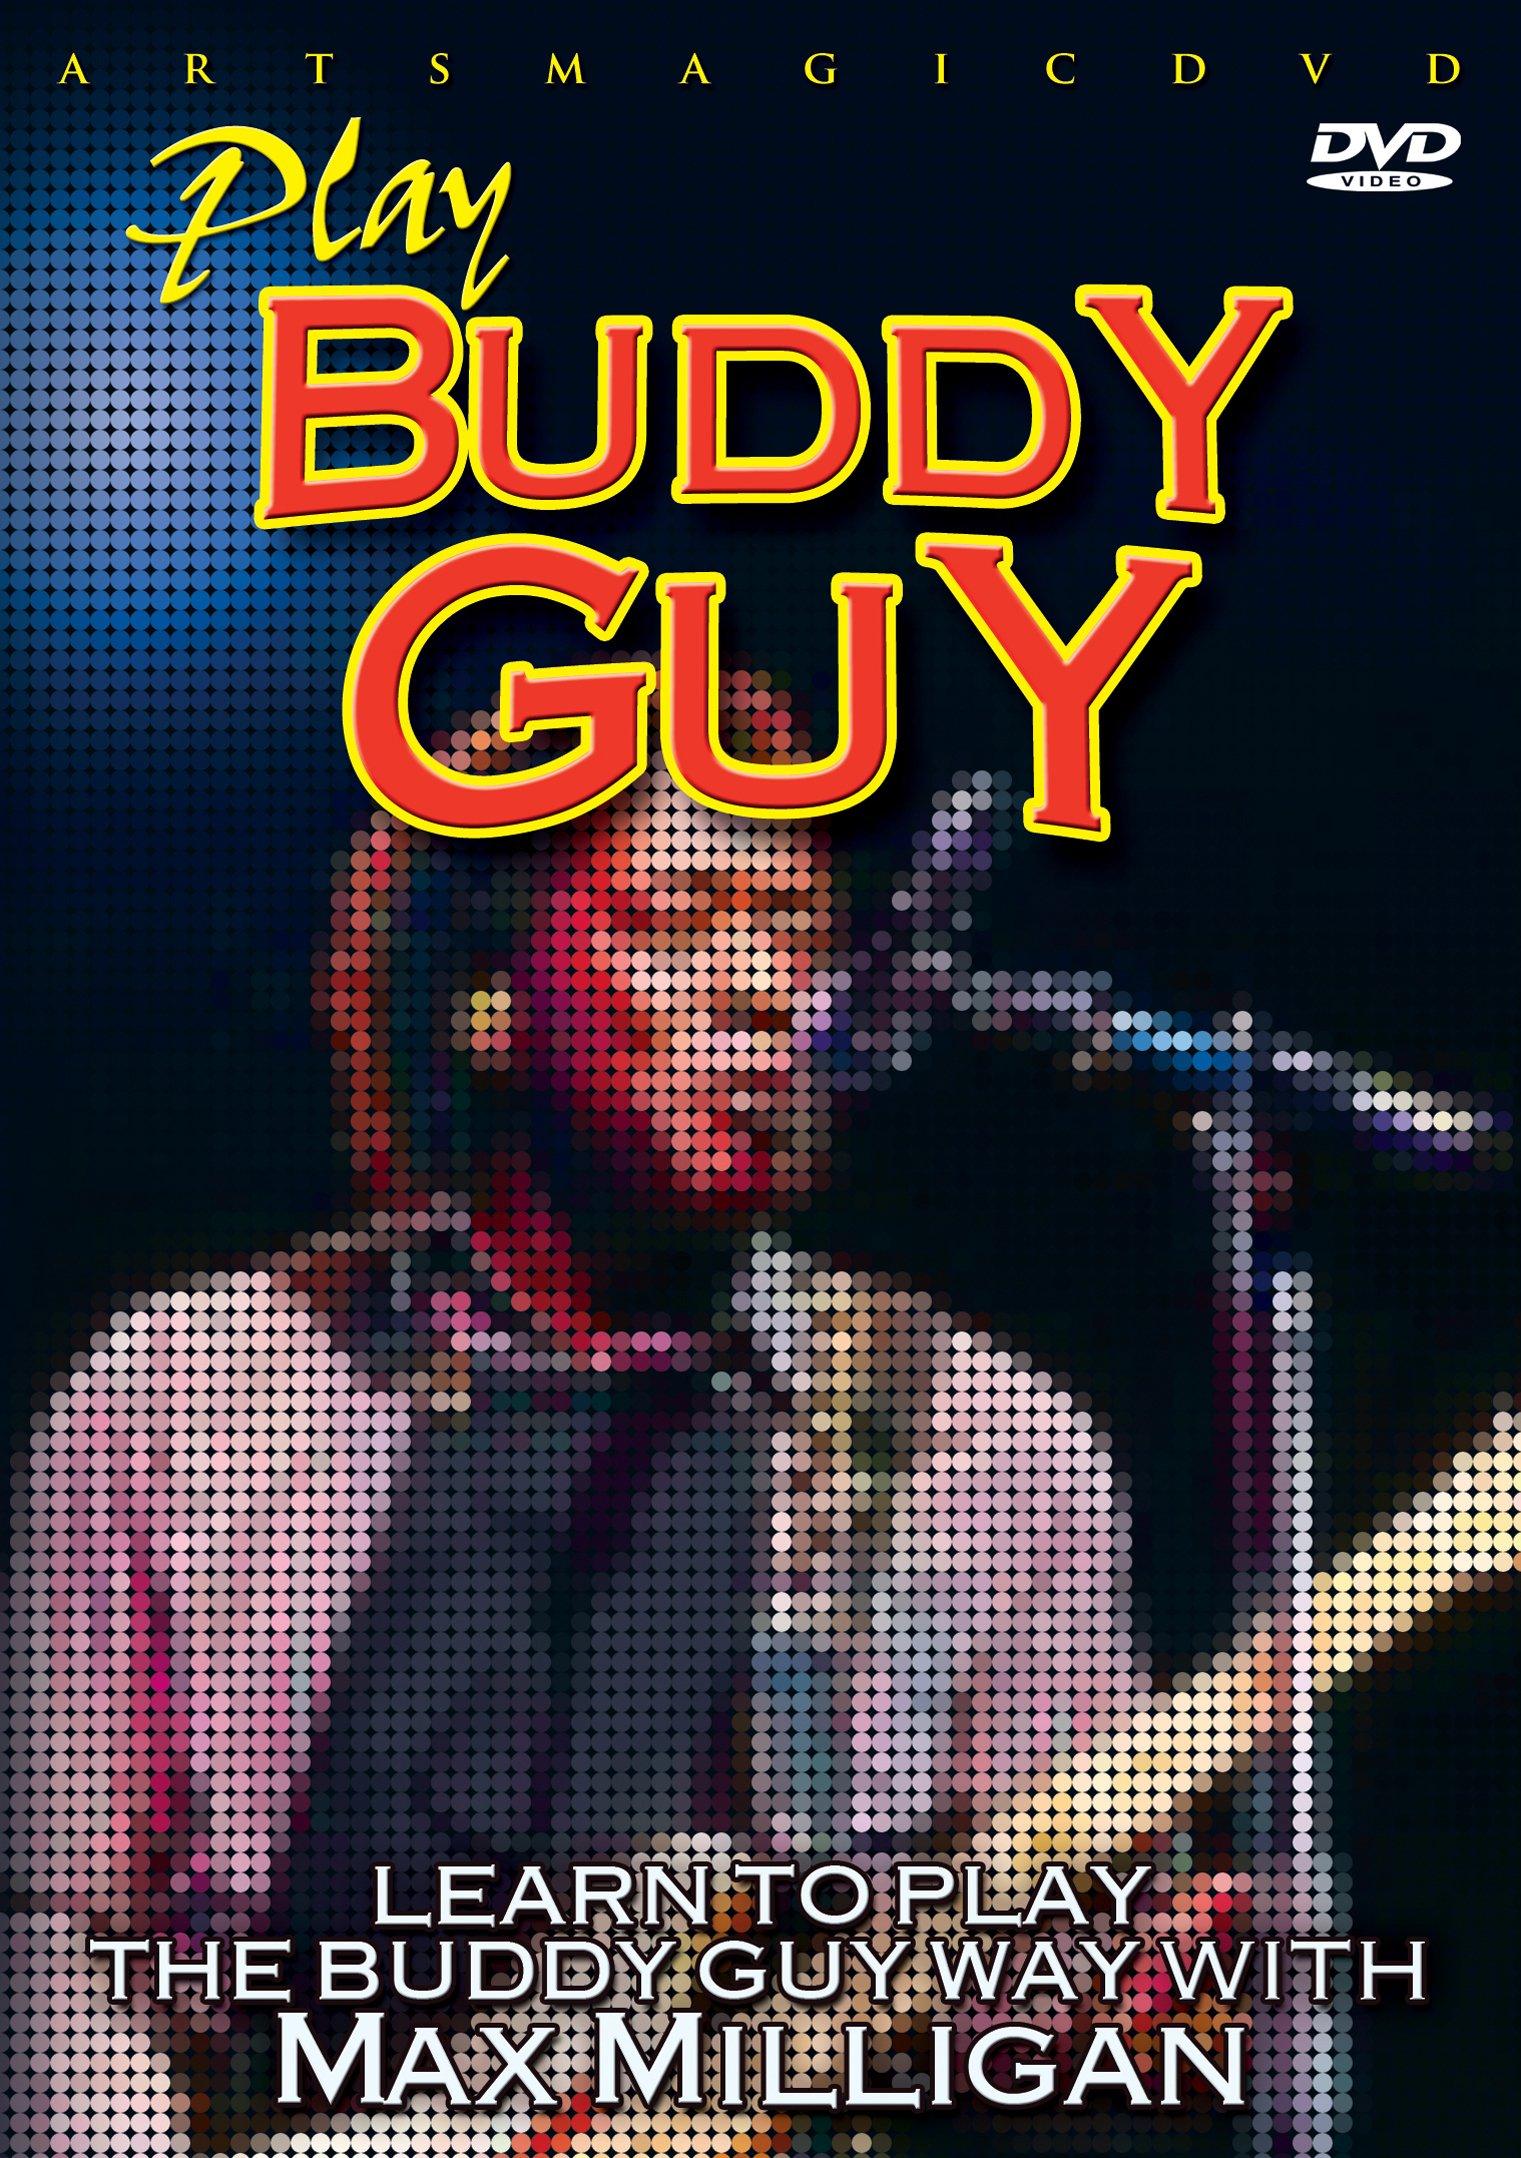 DVD : Max Milligan - Play Buddy Guy (DVD)